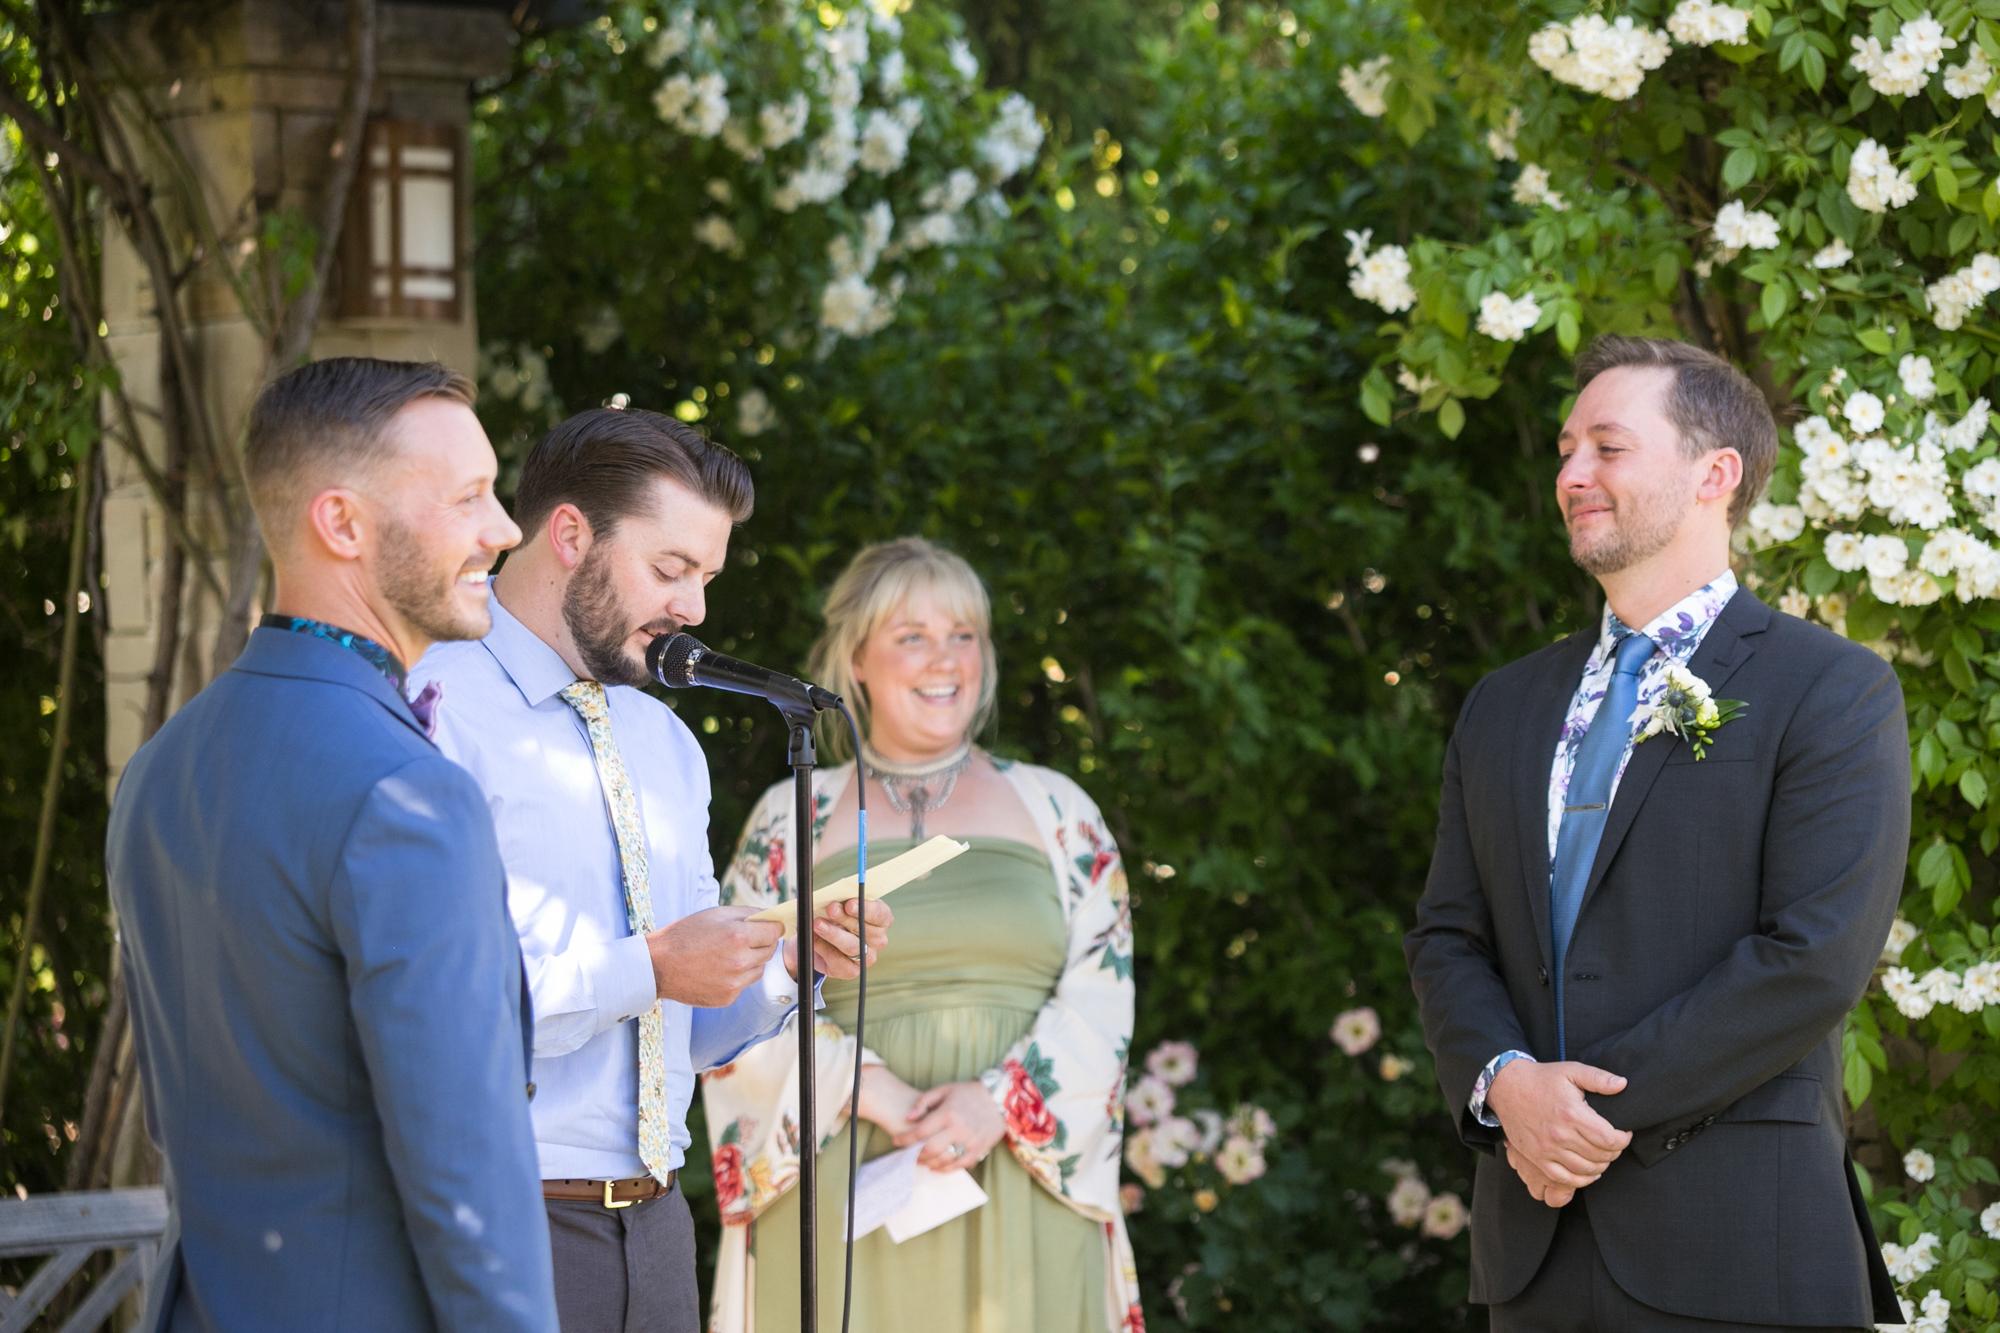 same-sex-wedding-red-butte-garden-17.jpg